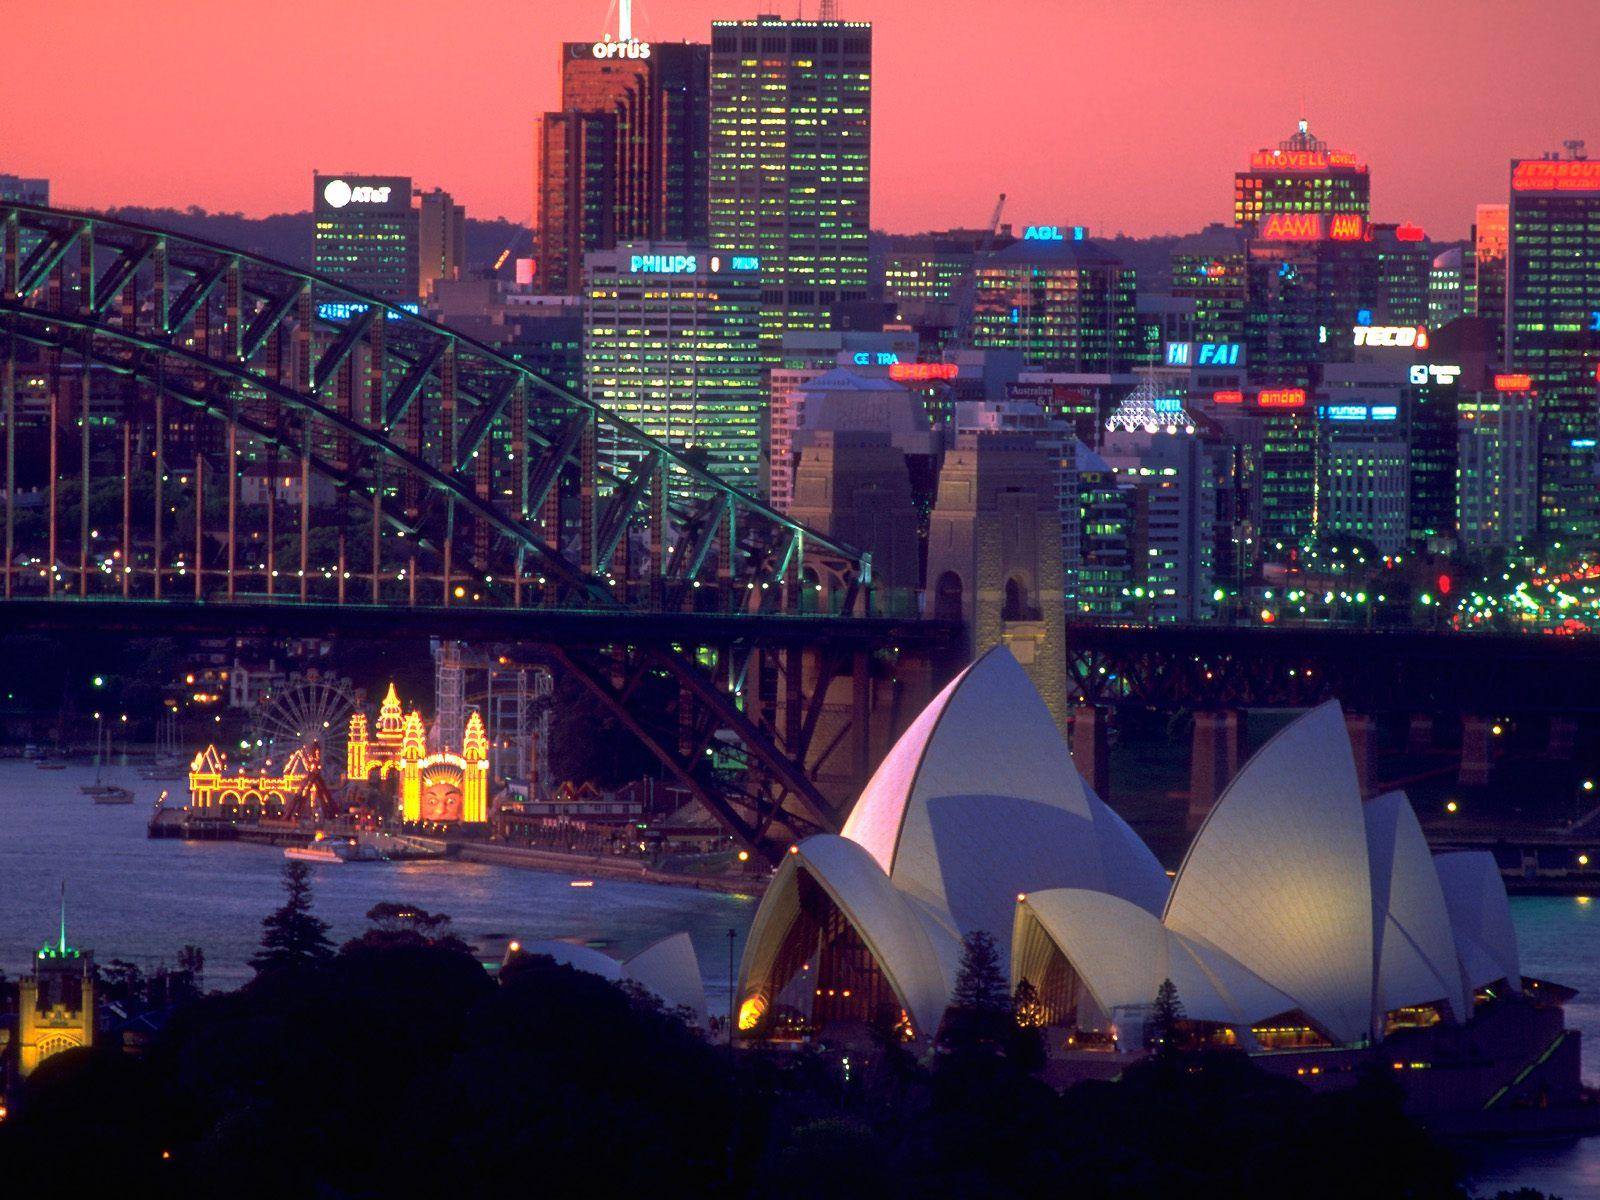 https://i2.wp.com/images.fanpop.com/images/image_uploads/Sydney-Skyline-australia-509534_1600_1200.jpg